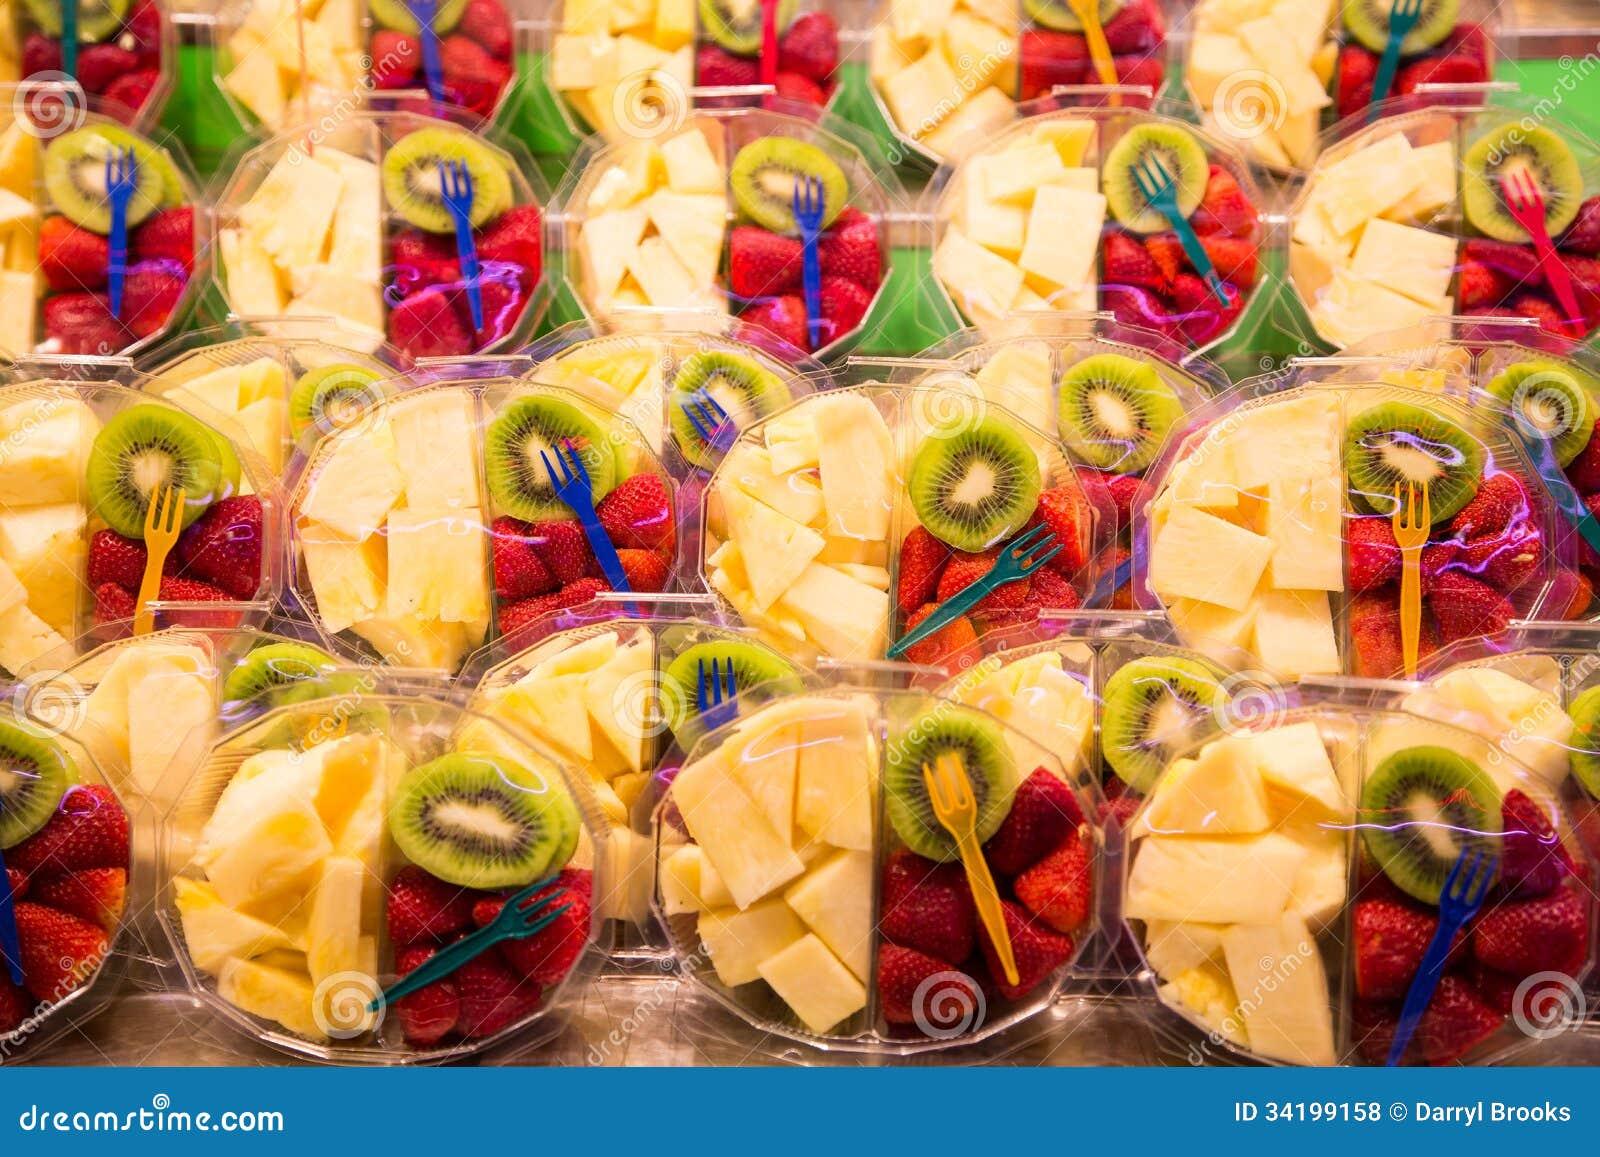 ananas erdbeere und kiwi to go lizenzfreie stockfotos bild 34199158. Black Bedroom Furniture Sets. Home Design Ideas